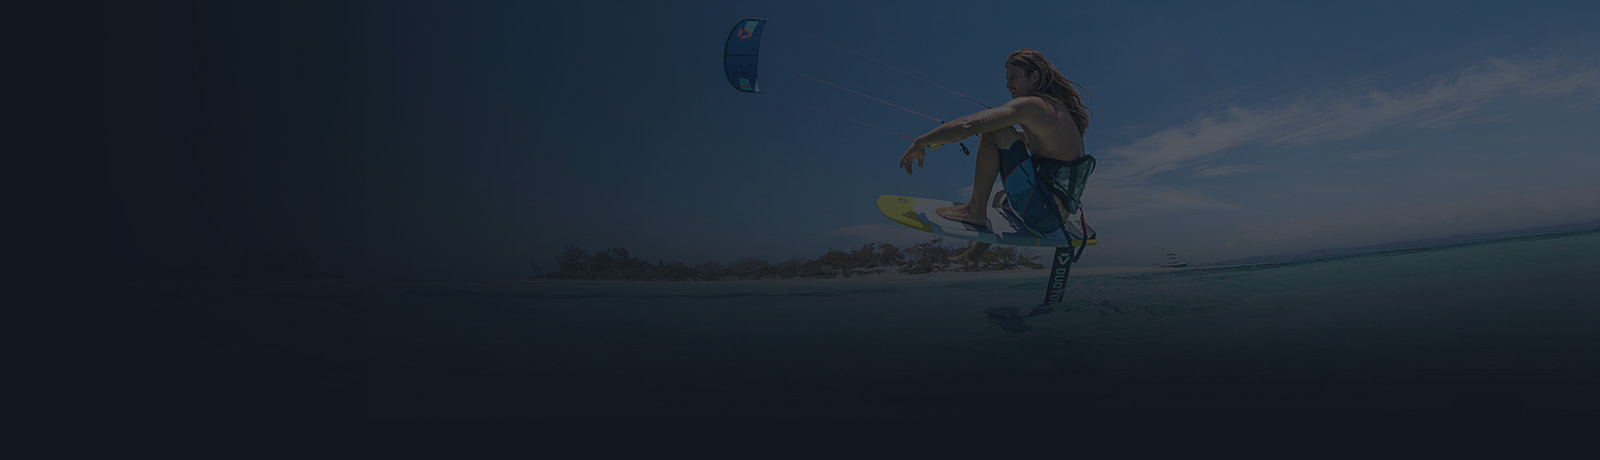 Windsurfing Banner